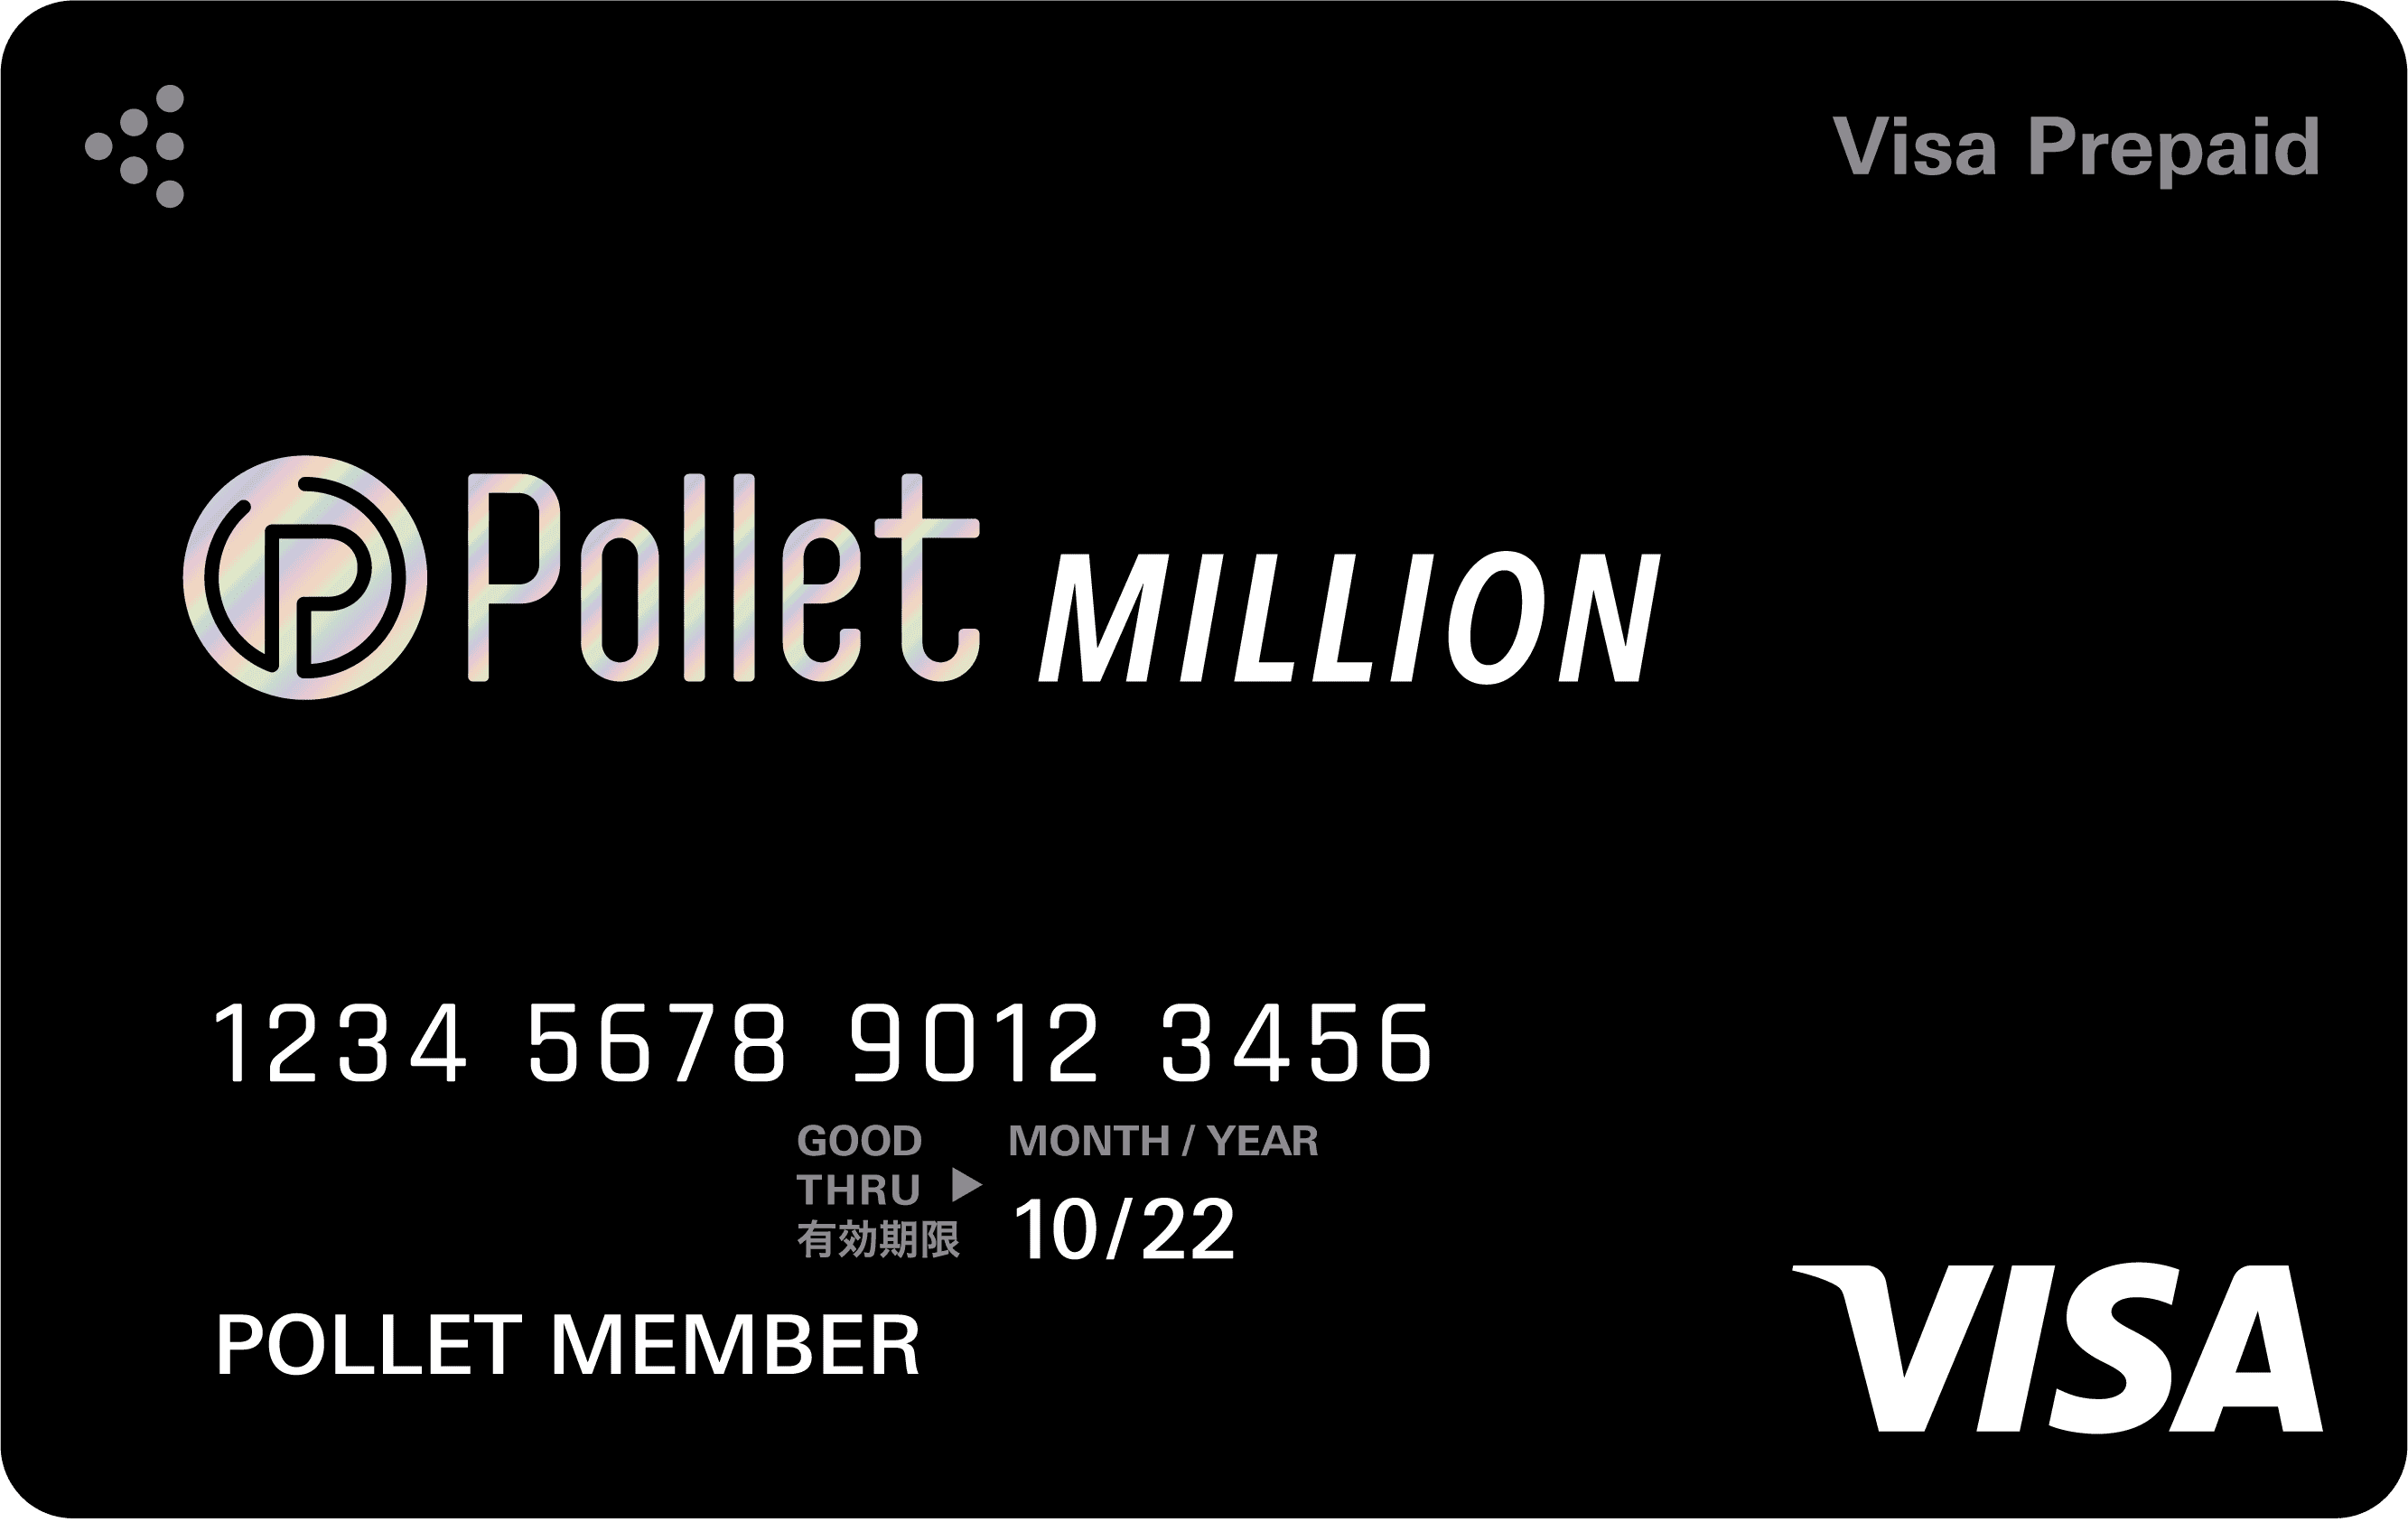 PolletMillionカード